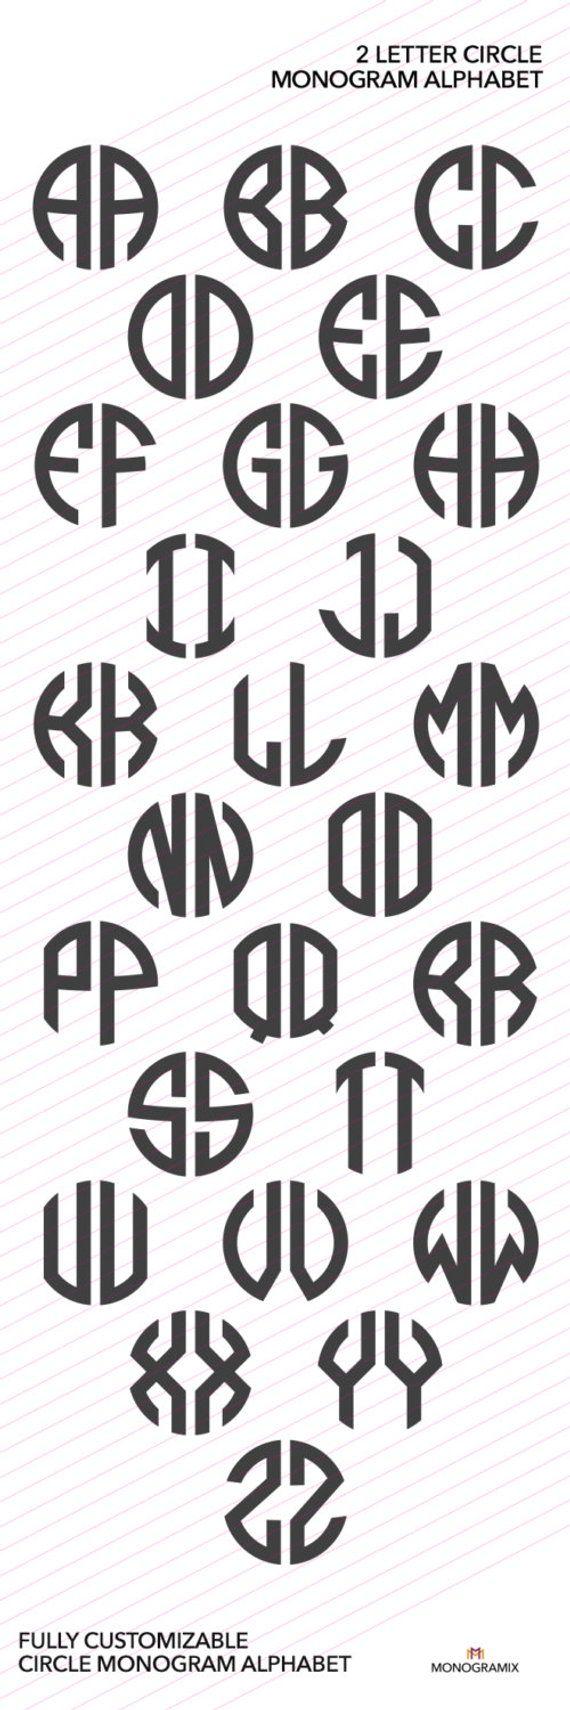 2 Letter SVG Monogram Font SVG Personal Monogram Font Letters SVG Personal Initials Monogram Svg Cut files for Silhouette Studio, Cricut